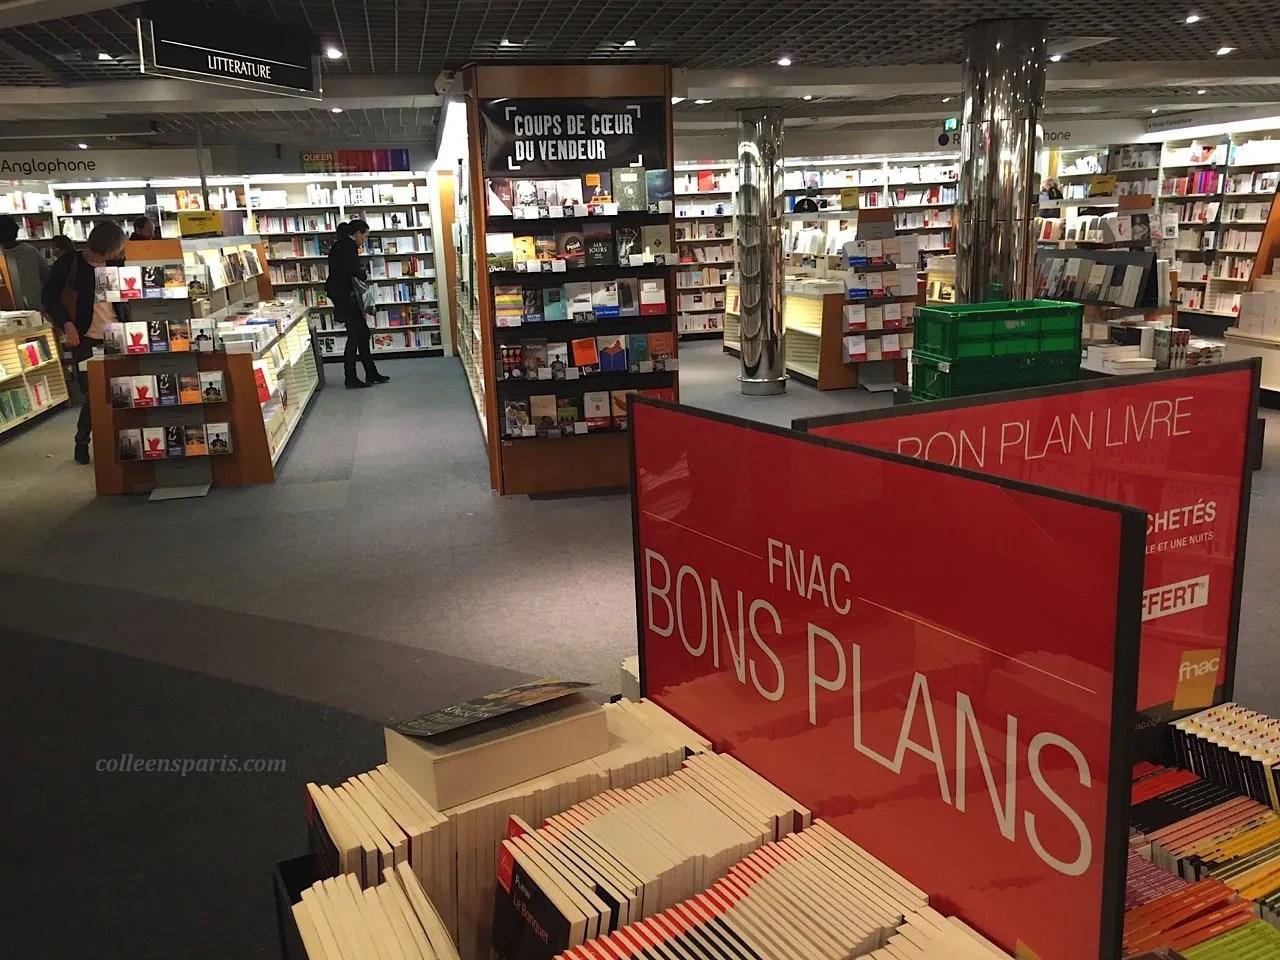 FNAC Bons Plans Livres-Books4365